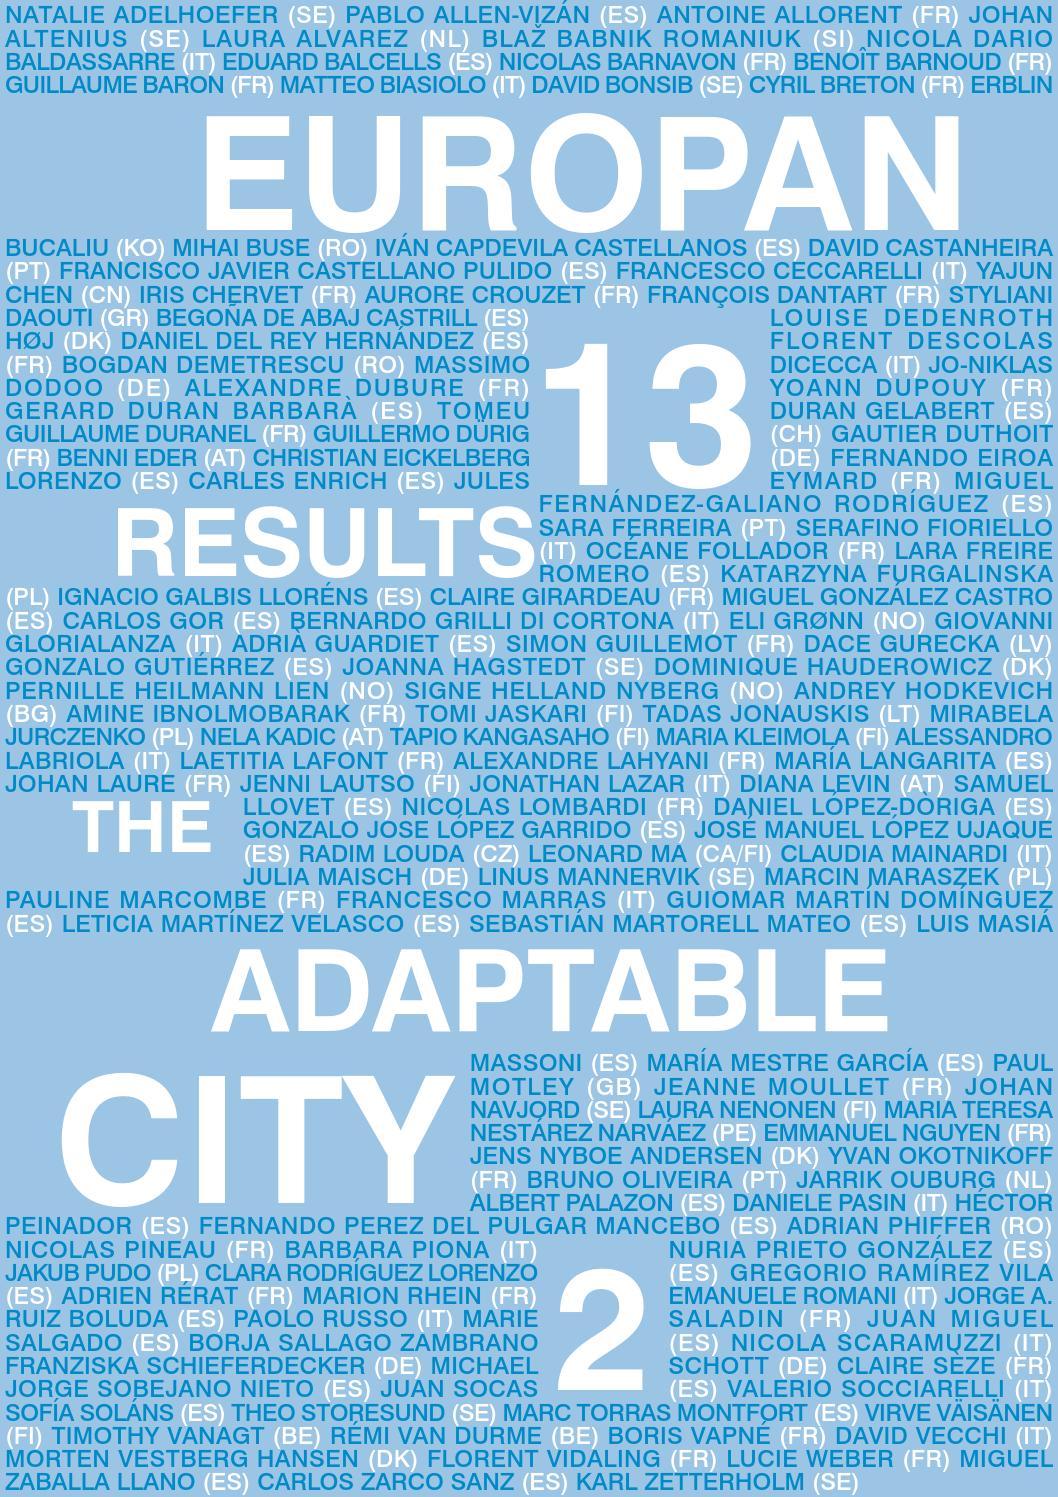 E13 Results Catalogue by Europan Europe - issuu